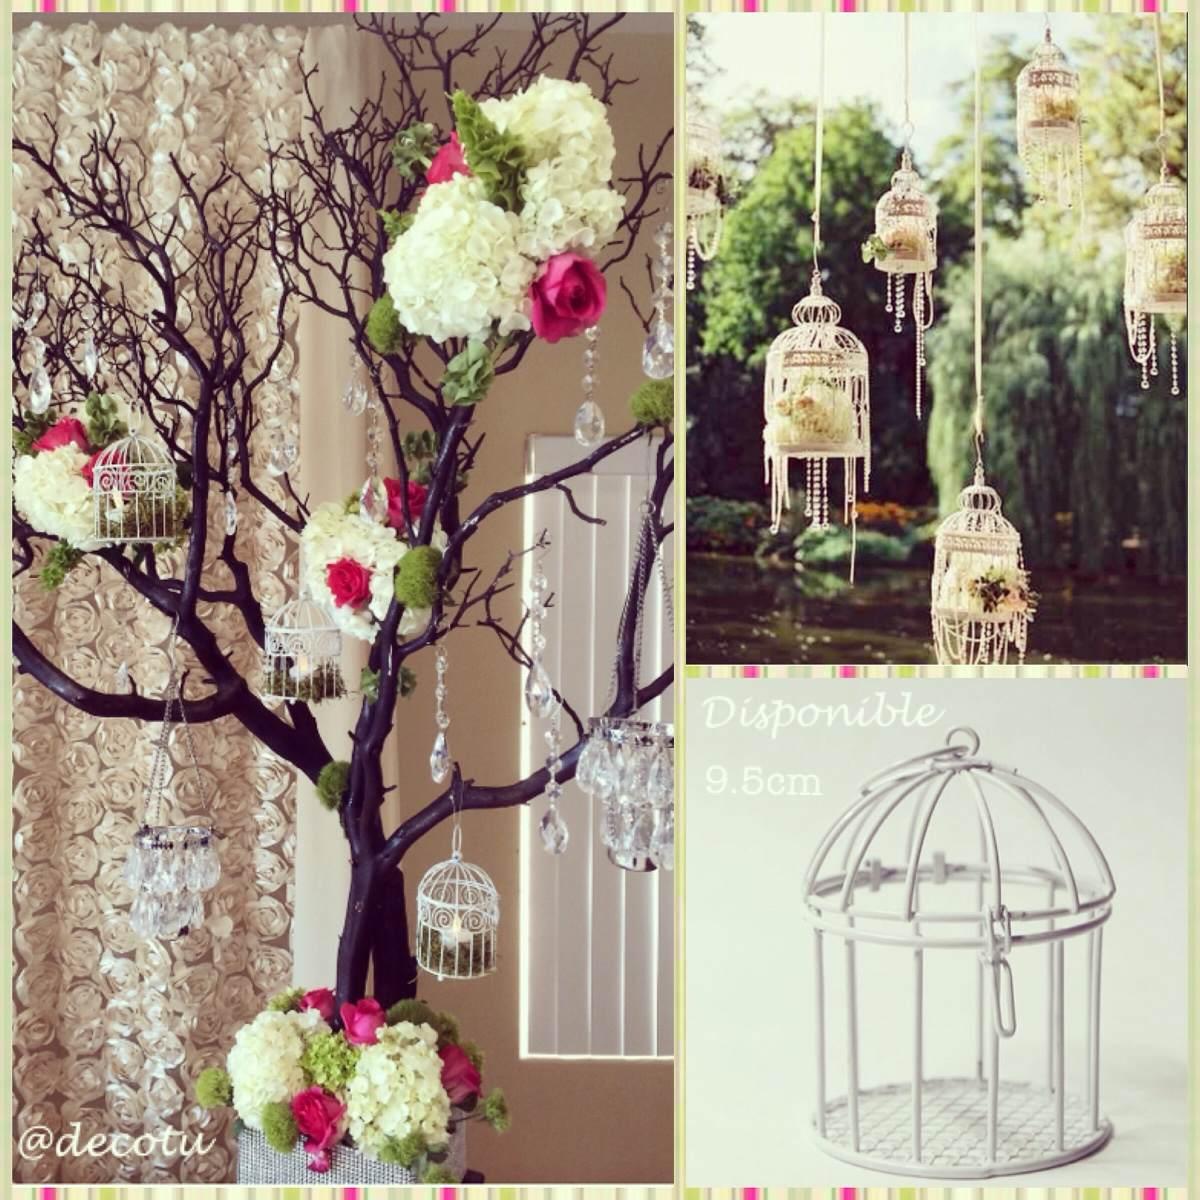 jaula recuerdo decoracin boda bautizo baby s vintage rattan